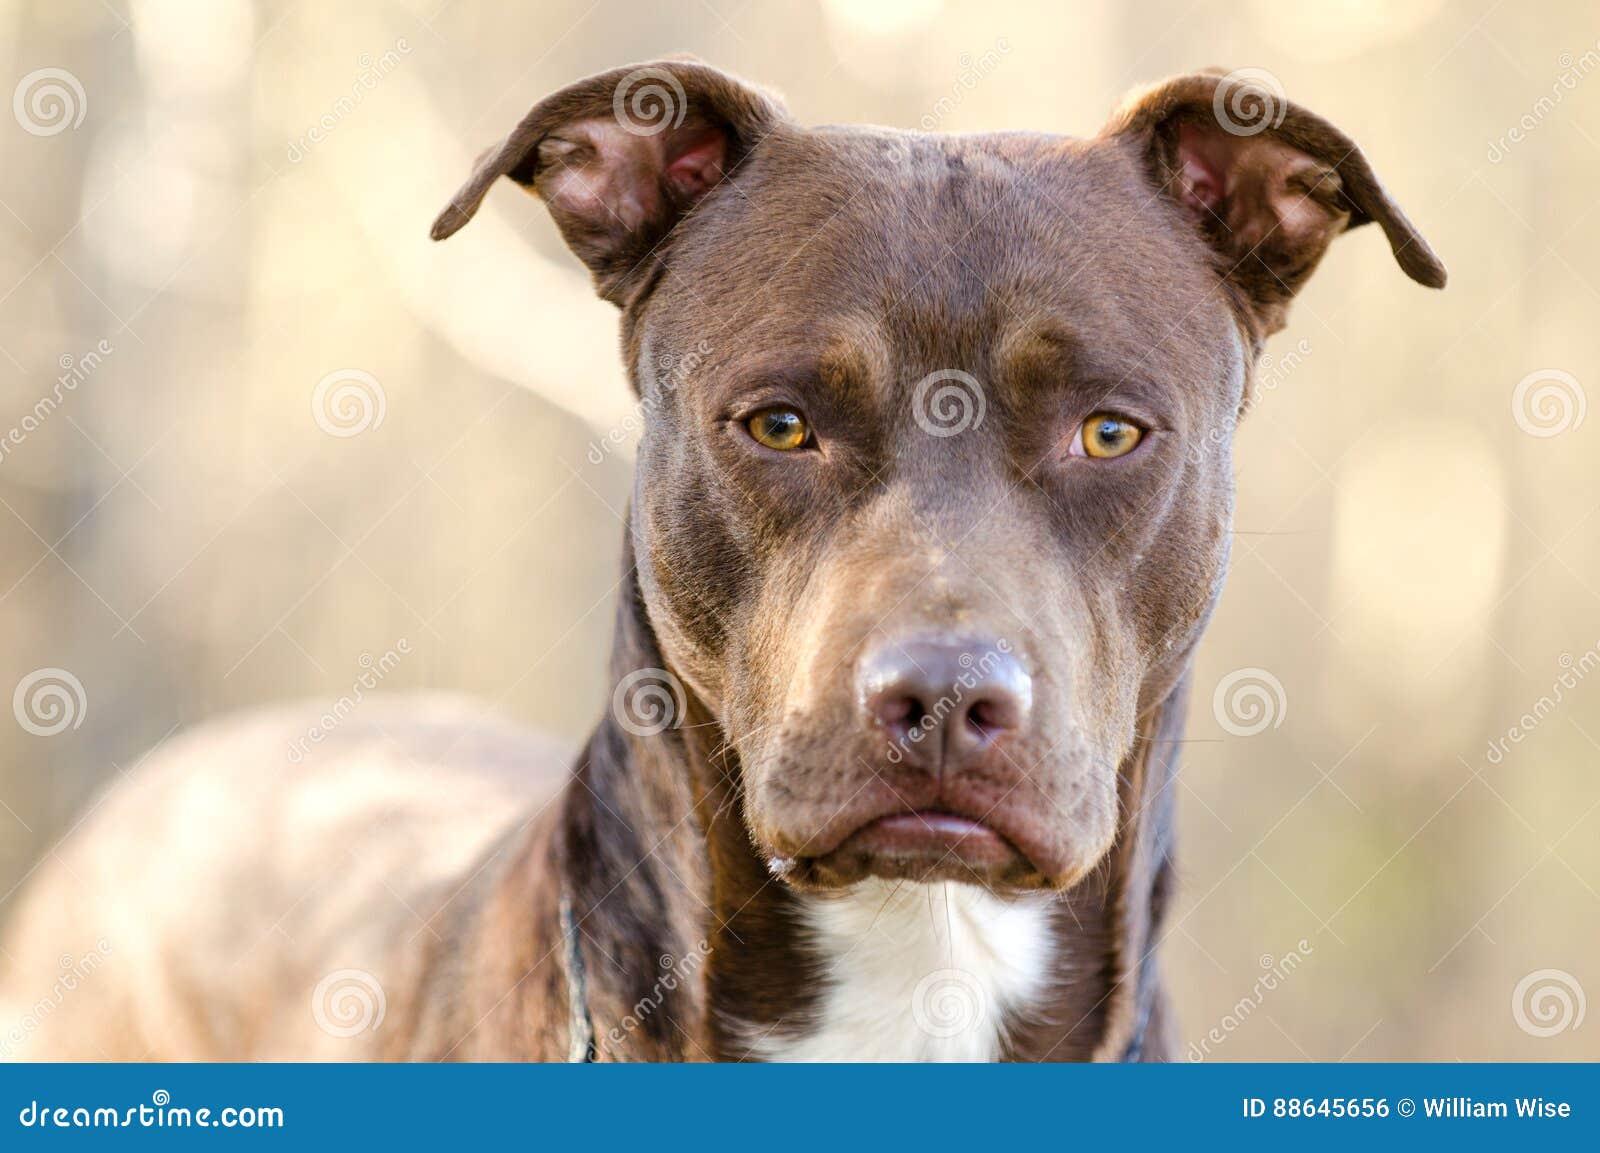 Chocolate American Pitbull Terrier Dog Walton County Animal